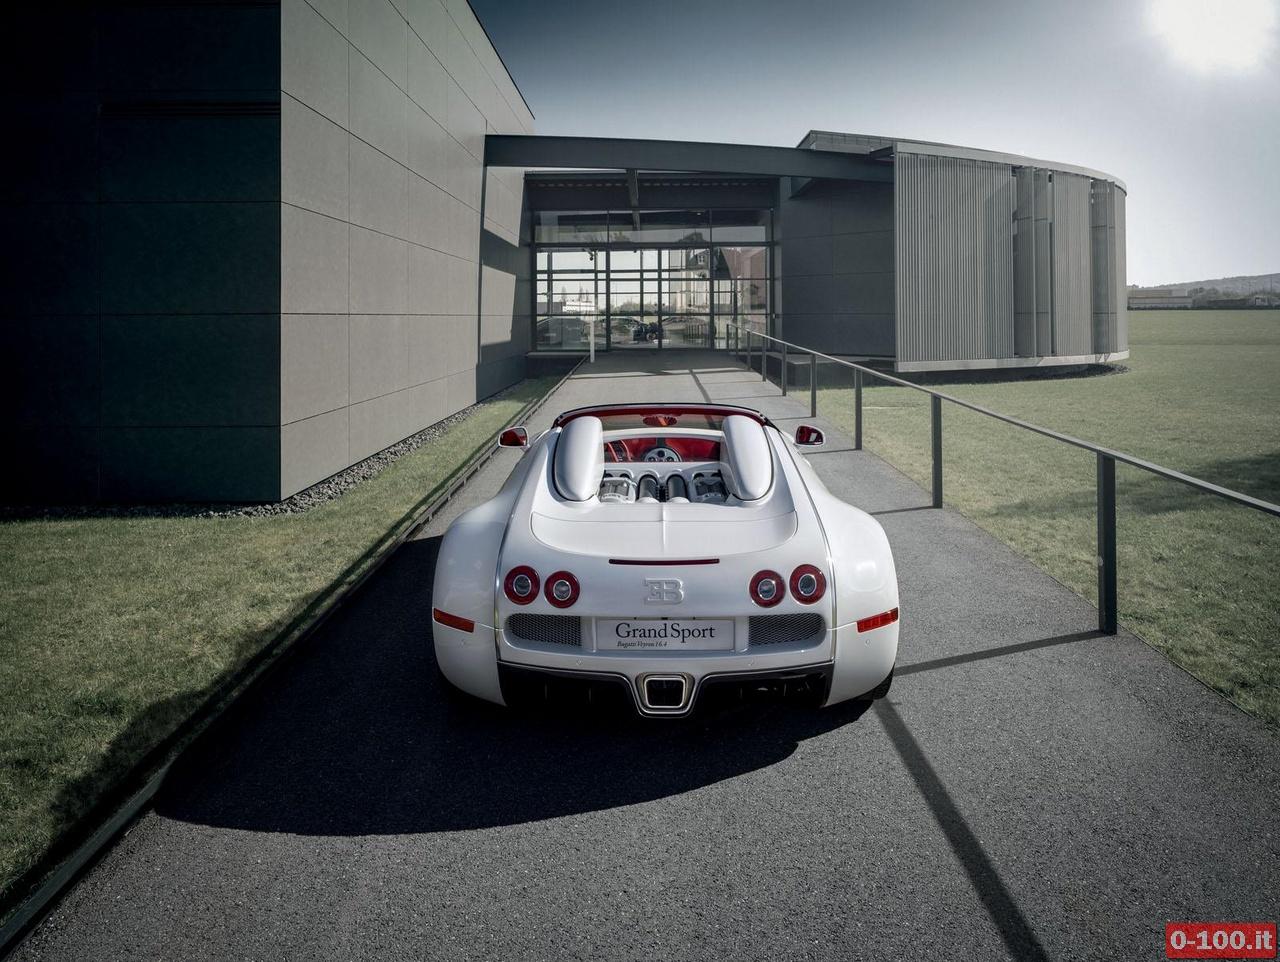 bugatti_veyron_grand_sport_wei-long_2012_0-100_44